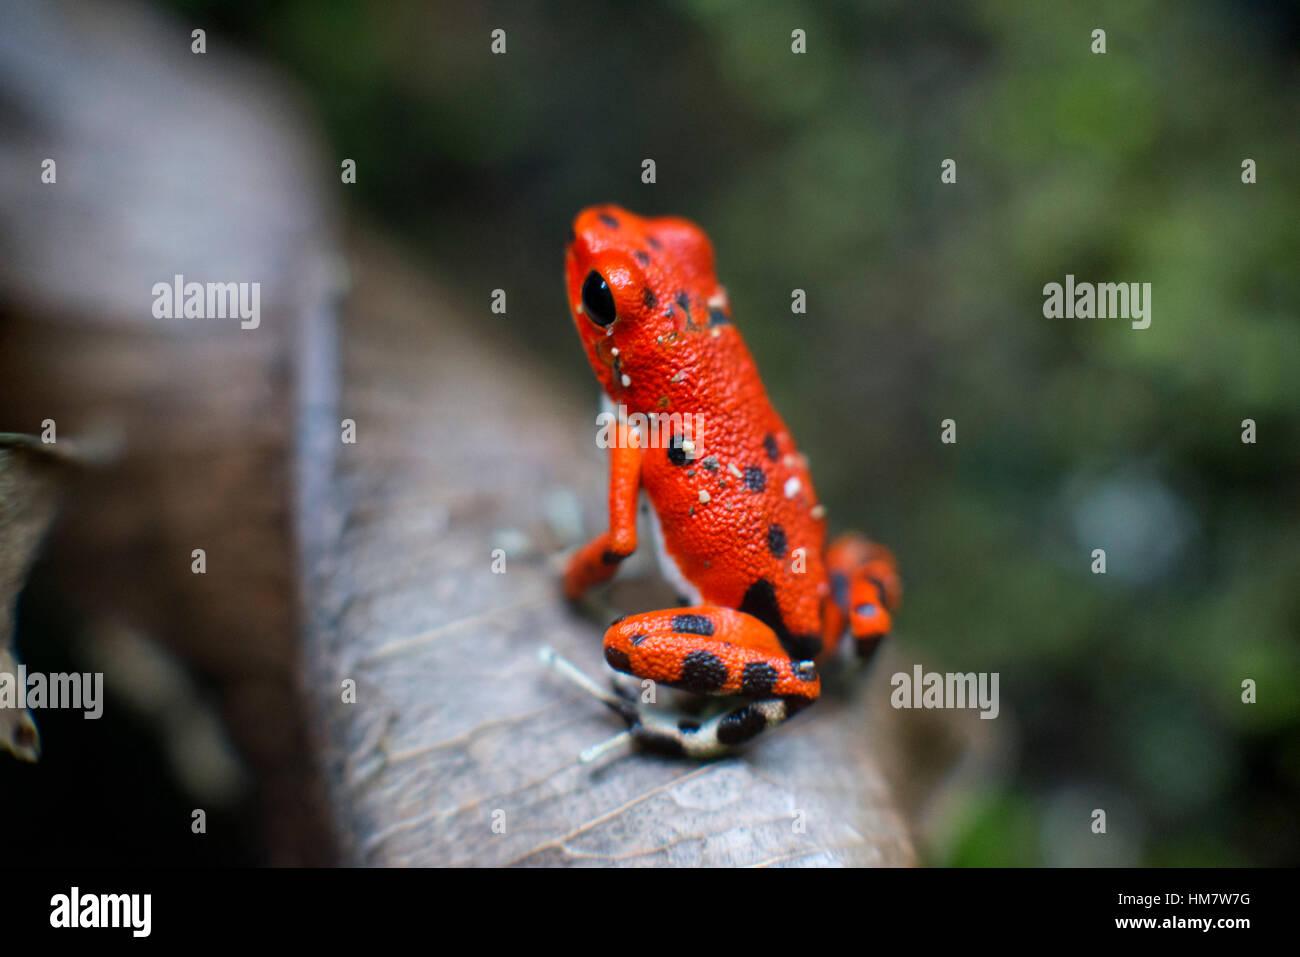 Strawberry Poison Frog (Dendrobates pumilio), adult, Bastimentos National Park, Bocas del Toro, Panama. The strawberry - Stock Image